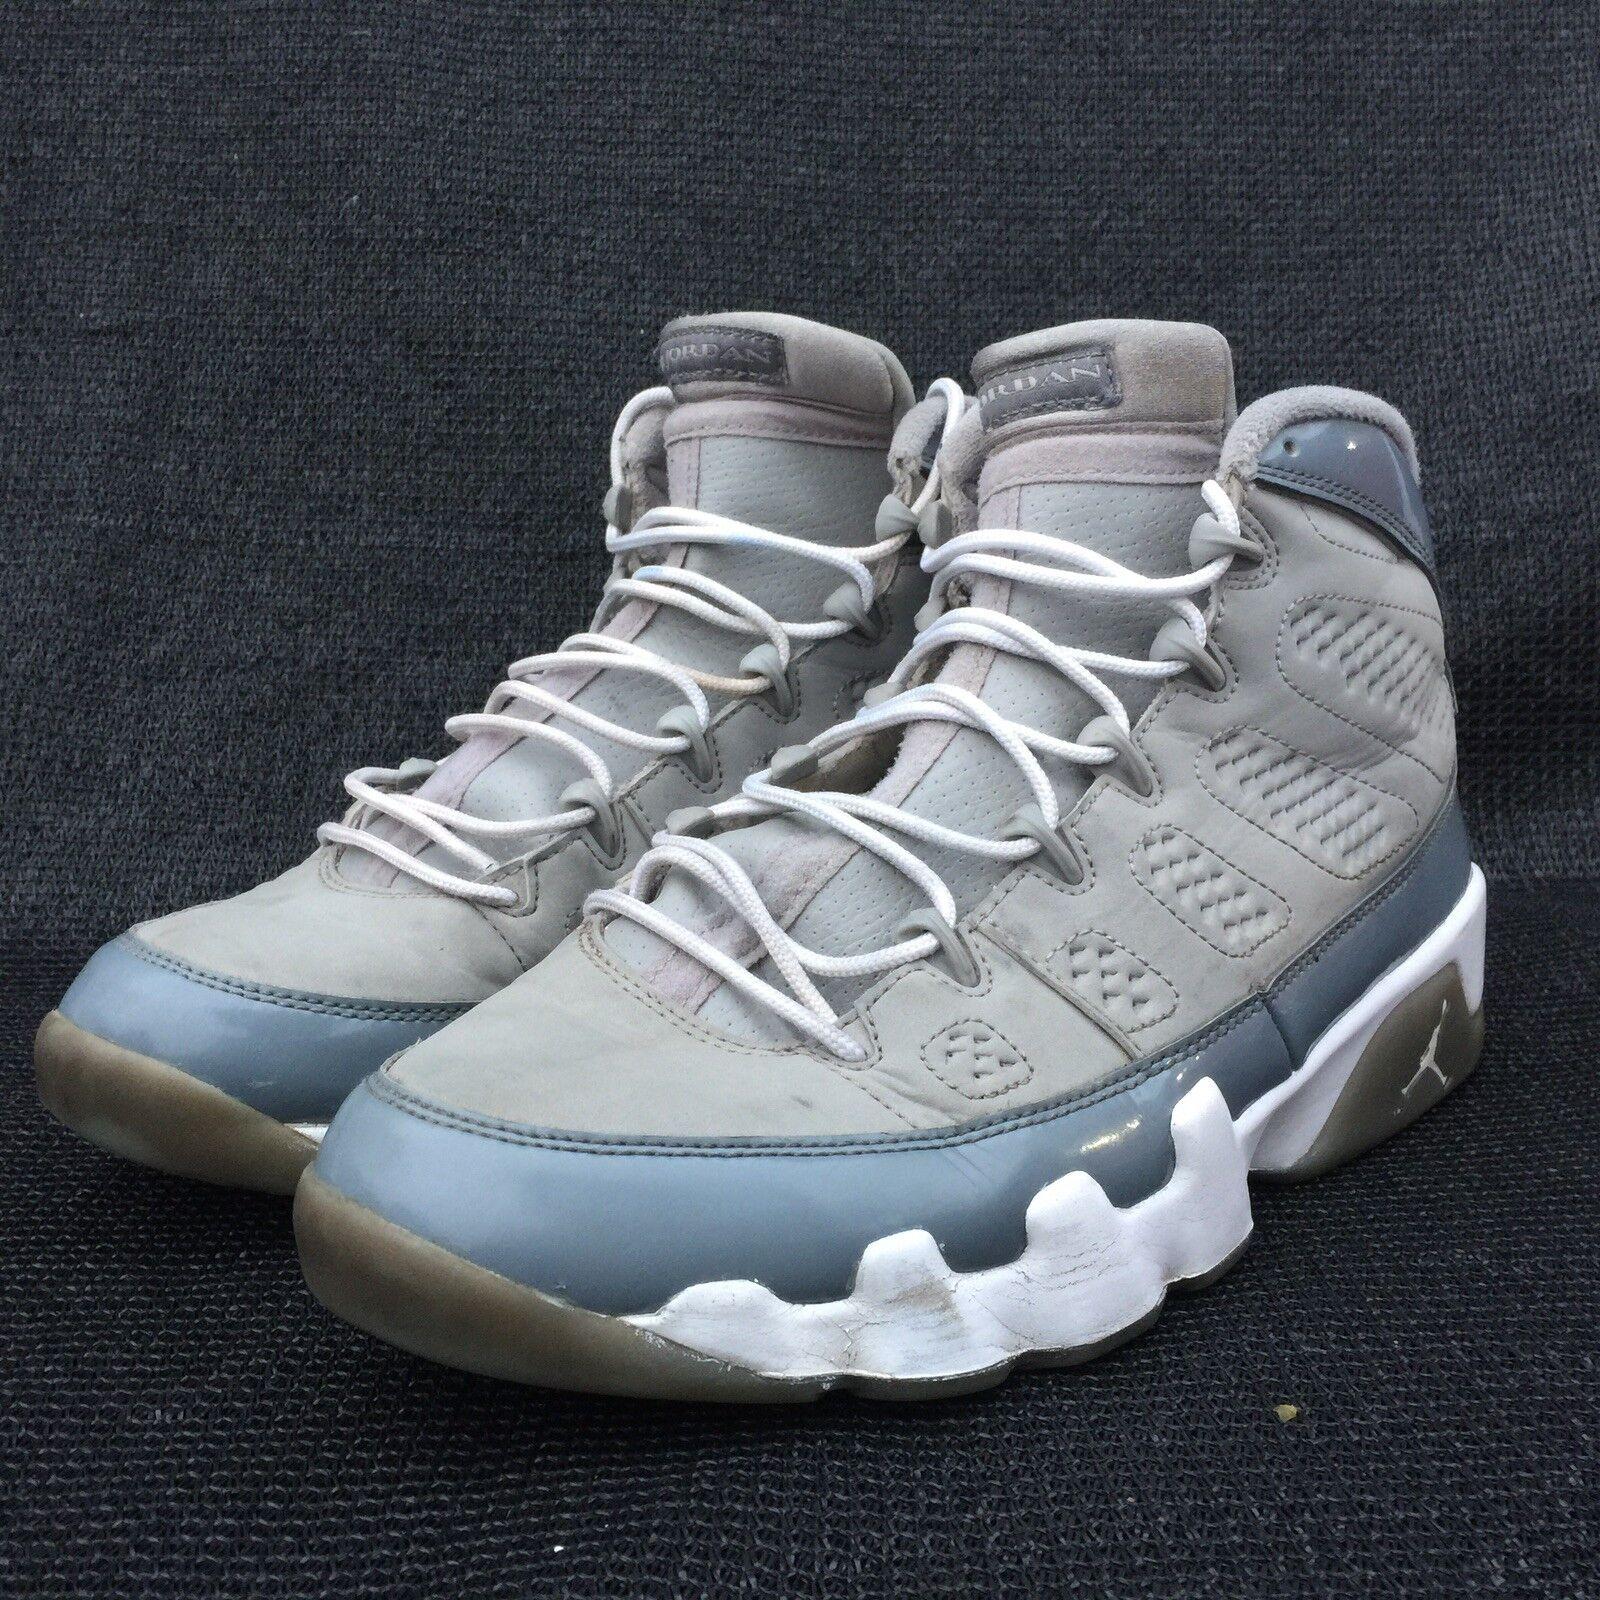 Men's Air Jordan Retro 9 XIV Cool Grey Size 9 302370 015